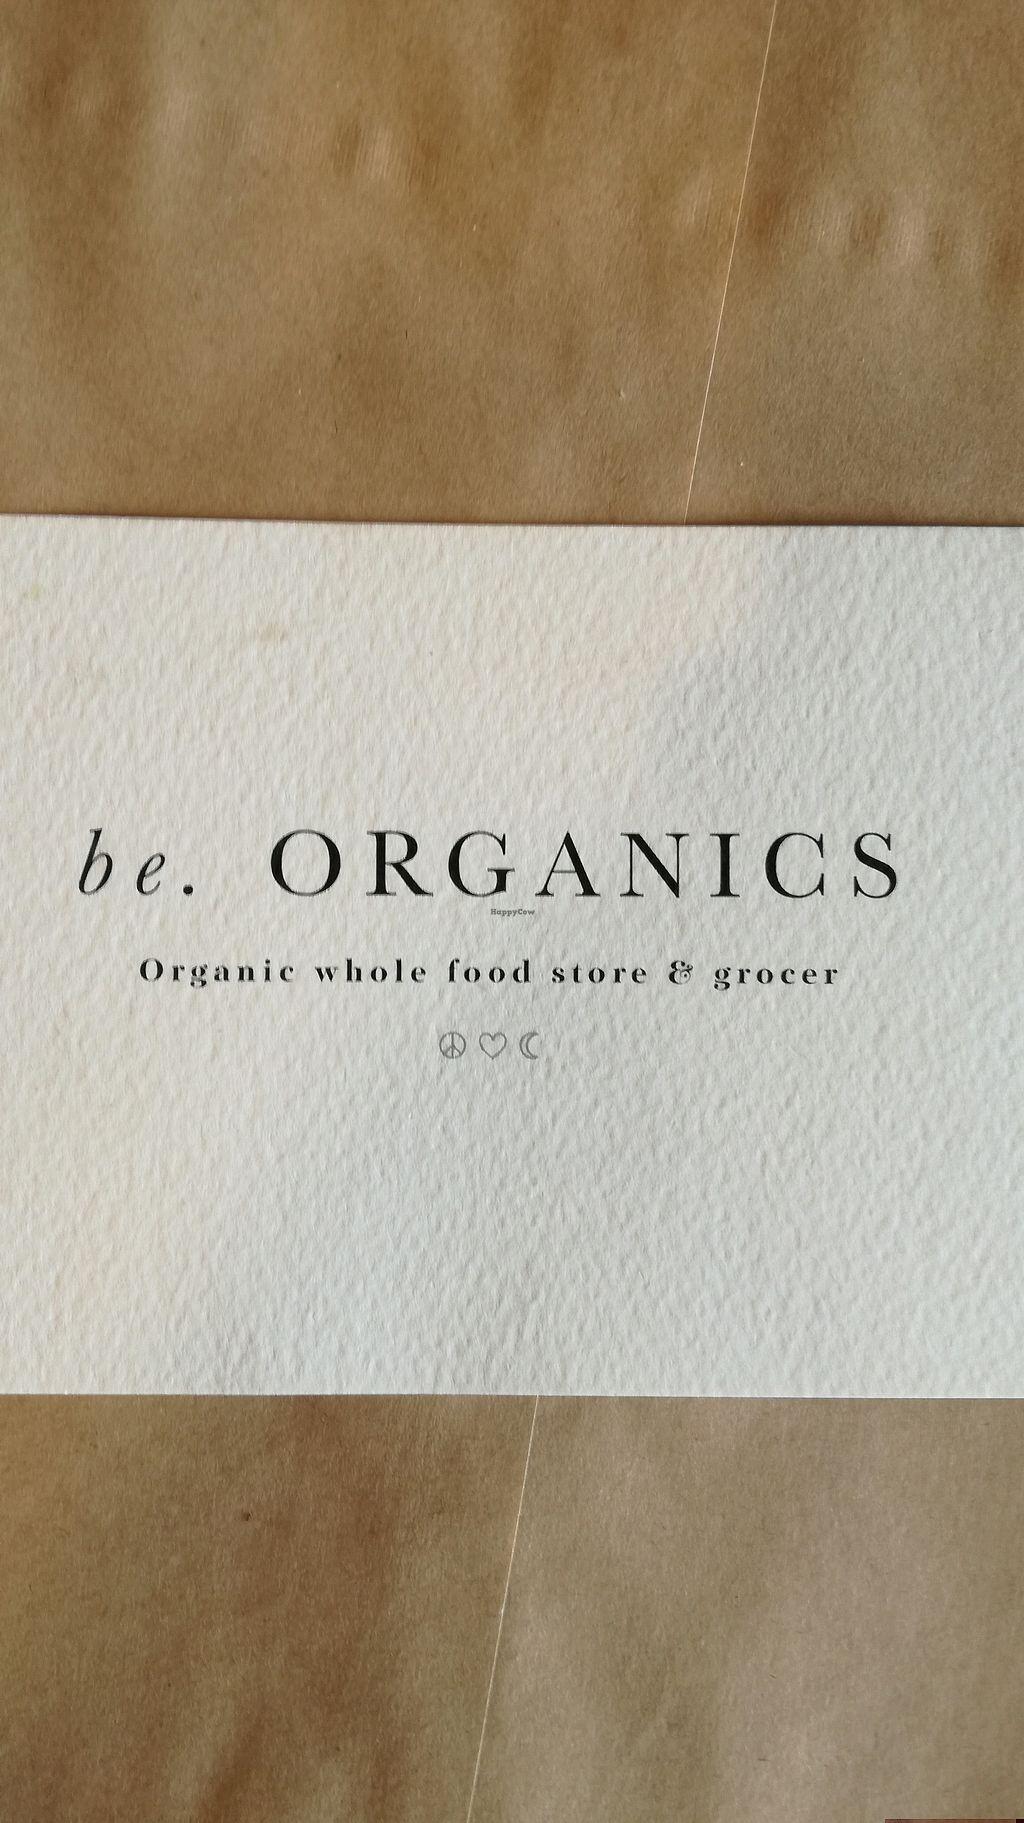 "Photo of Be Organics  by <a href=""/members/profile/evajelen"">evajelen</a> <br/>beOrganics <br/> January 24, 2018  - <a href='/contact/abuse/image/109841/350246'>Report</a>"